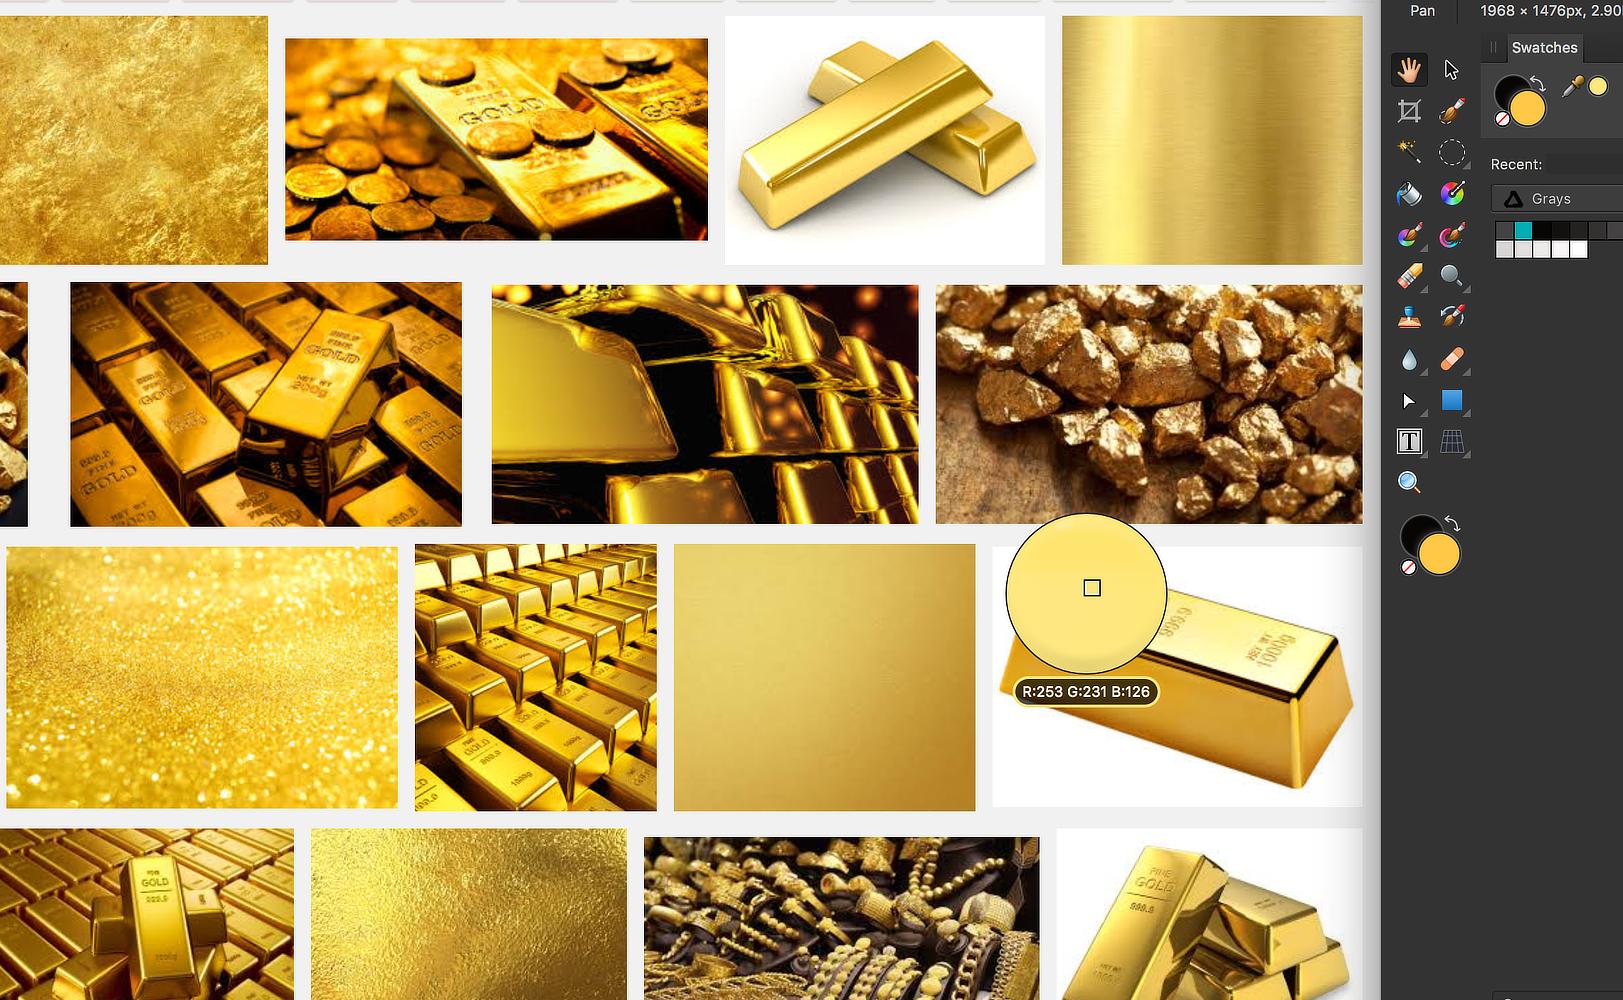 GOLD color definition - Affinity on Desktop Questions (Mac